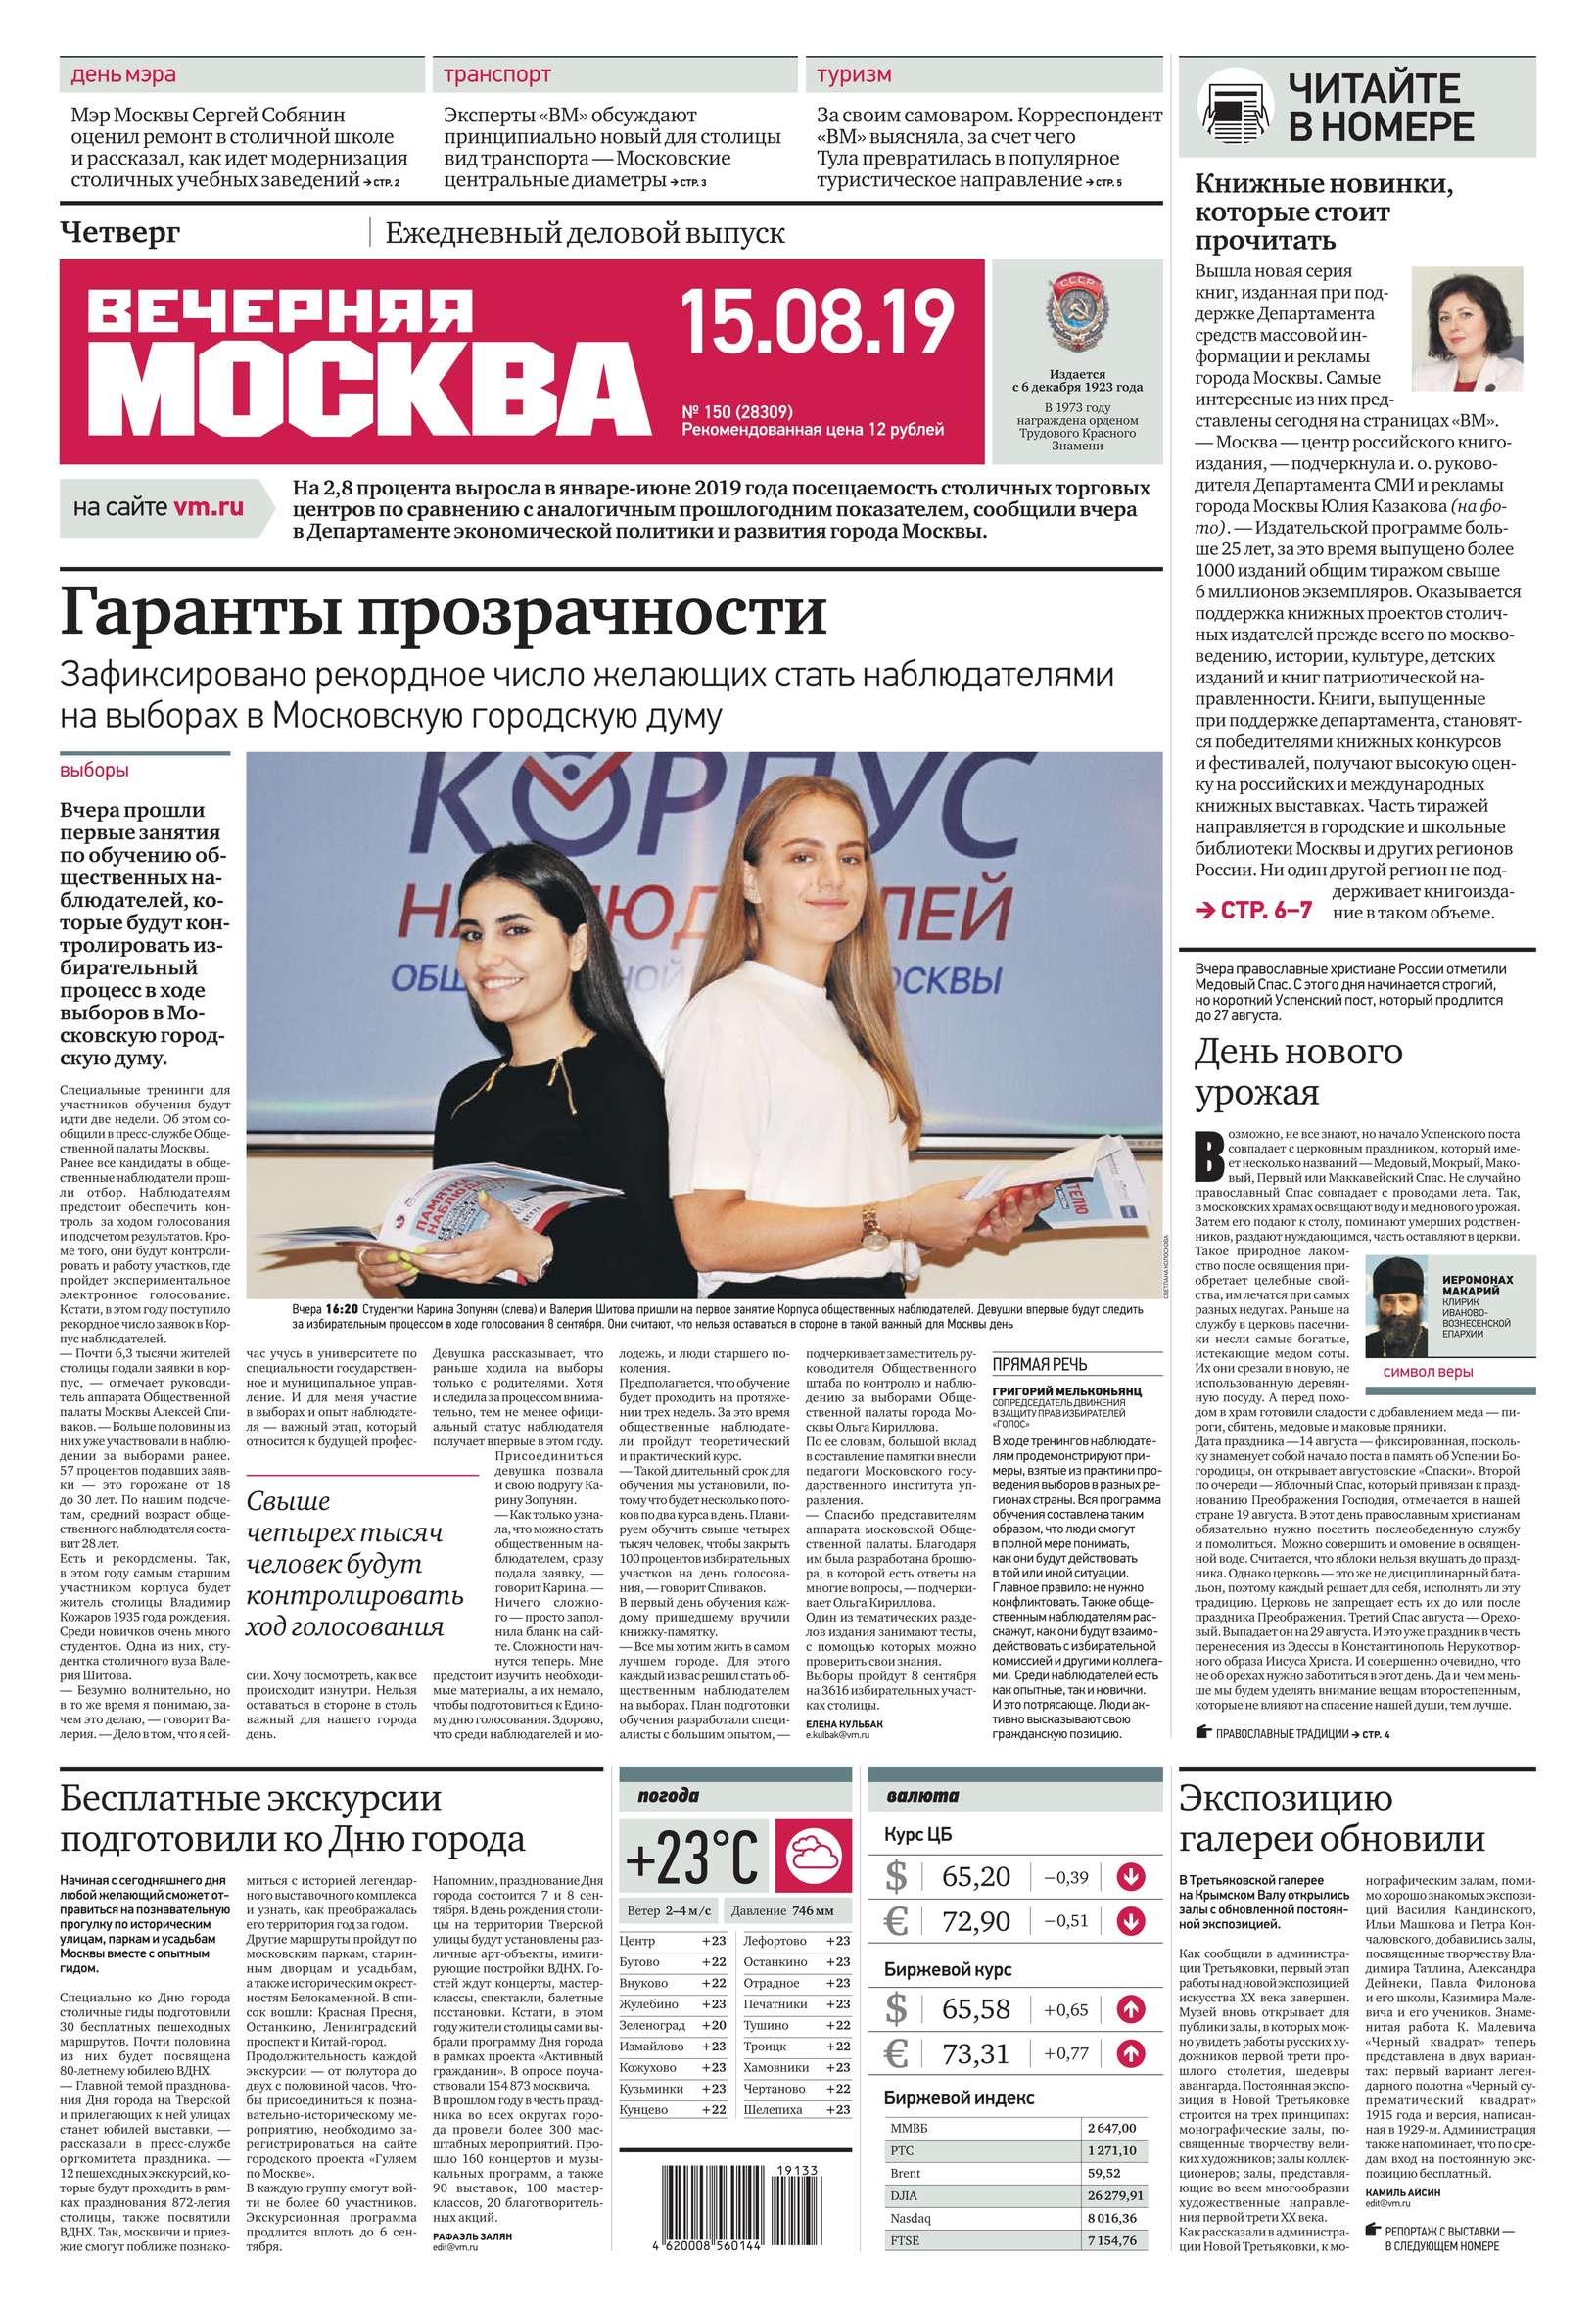 Редакция газеты Вечерняя Москва Вечерняя Москва 150-2019 авиабилеты москва алмаата